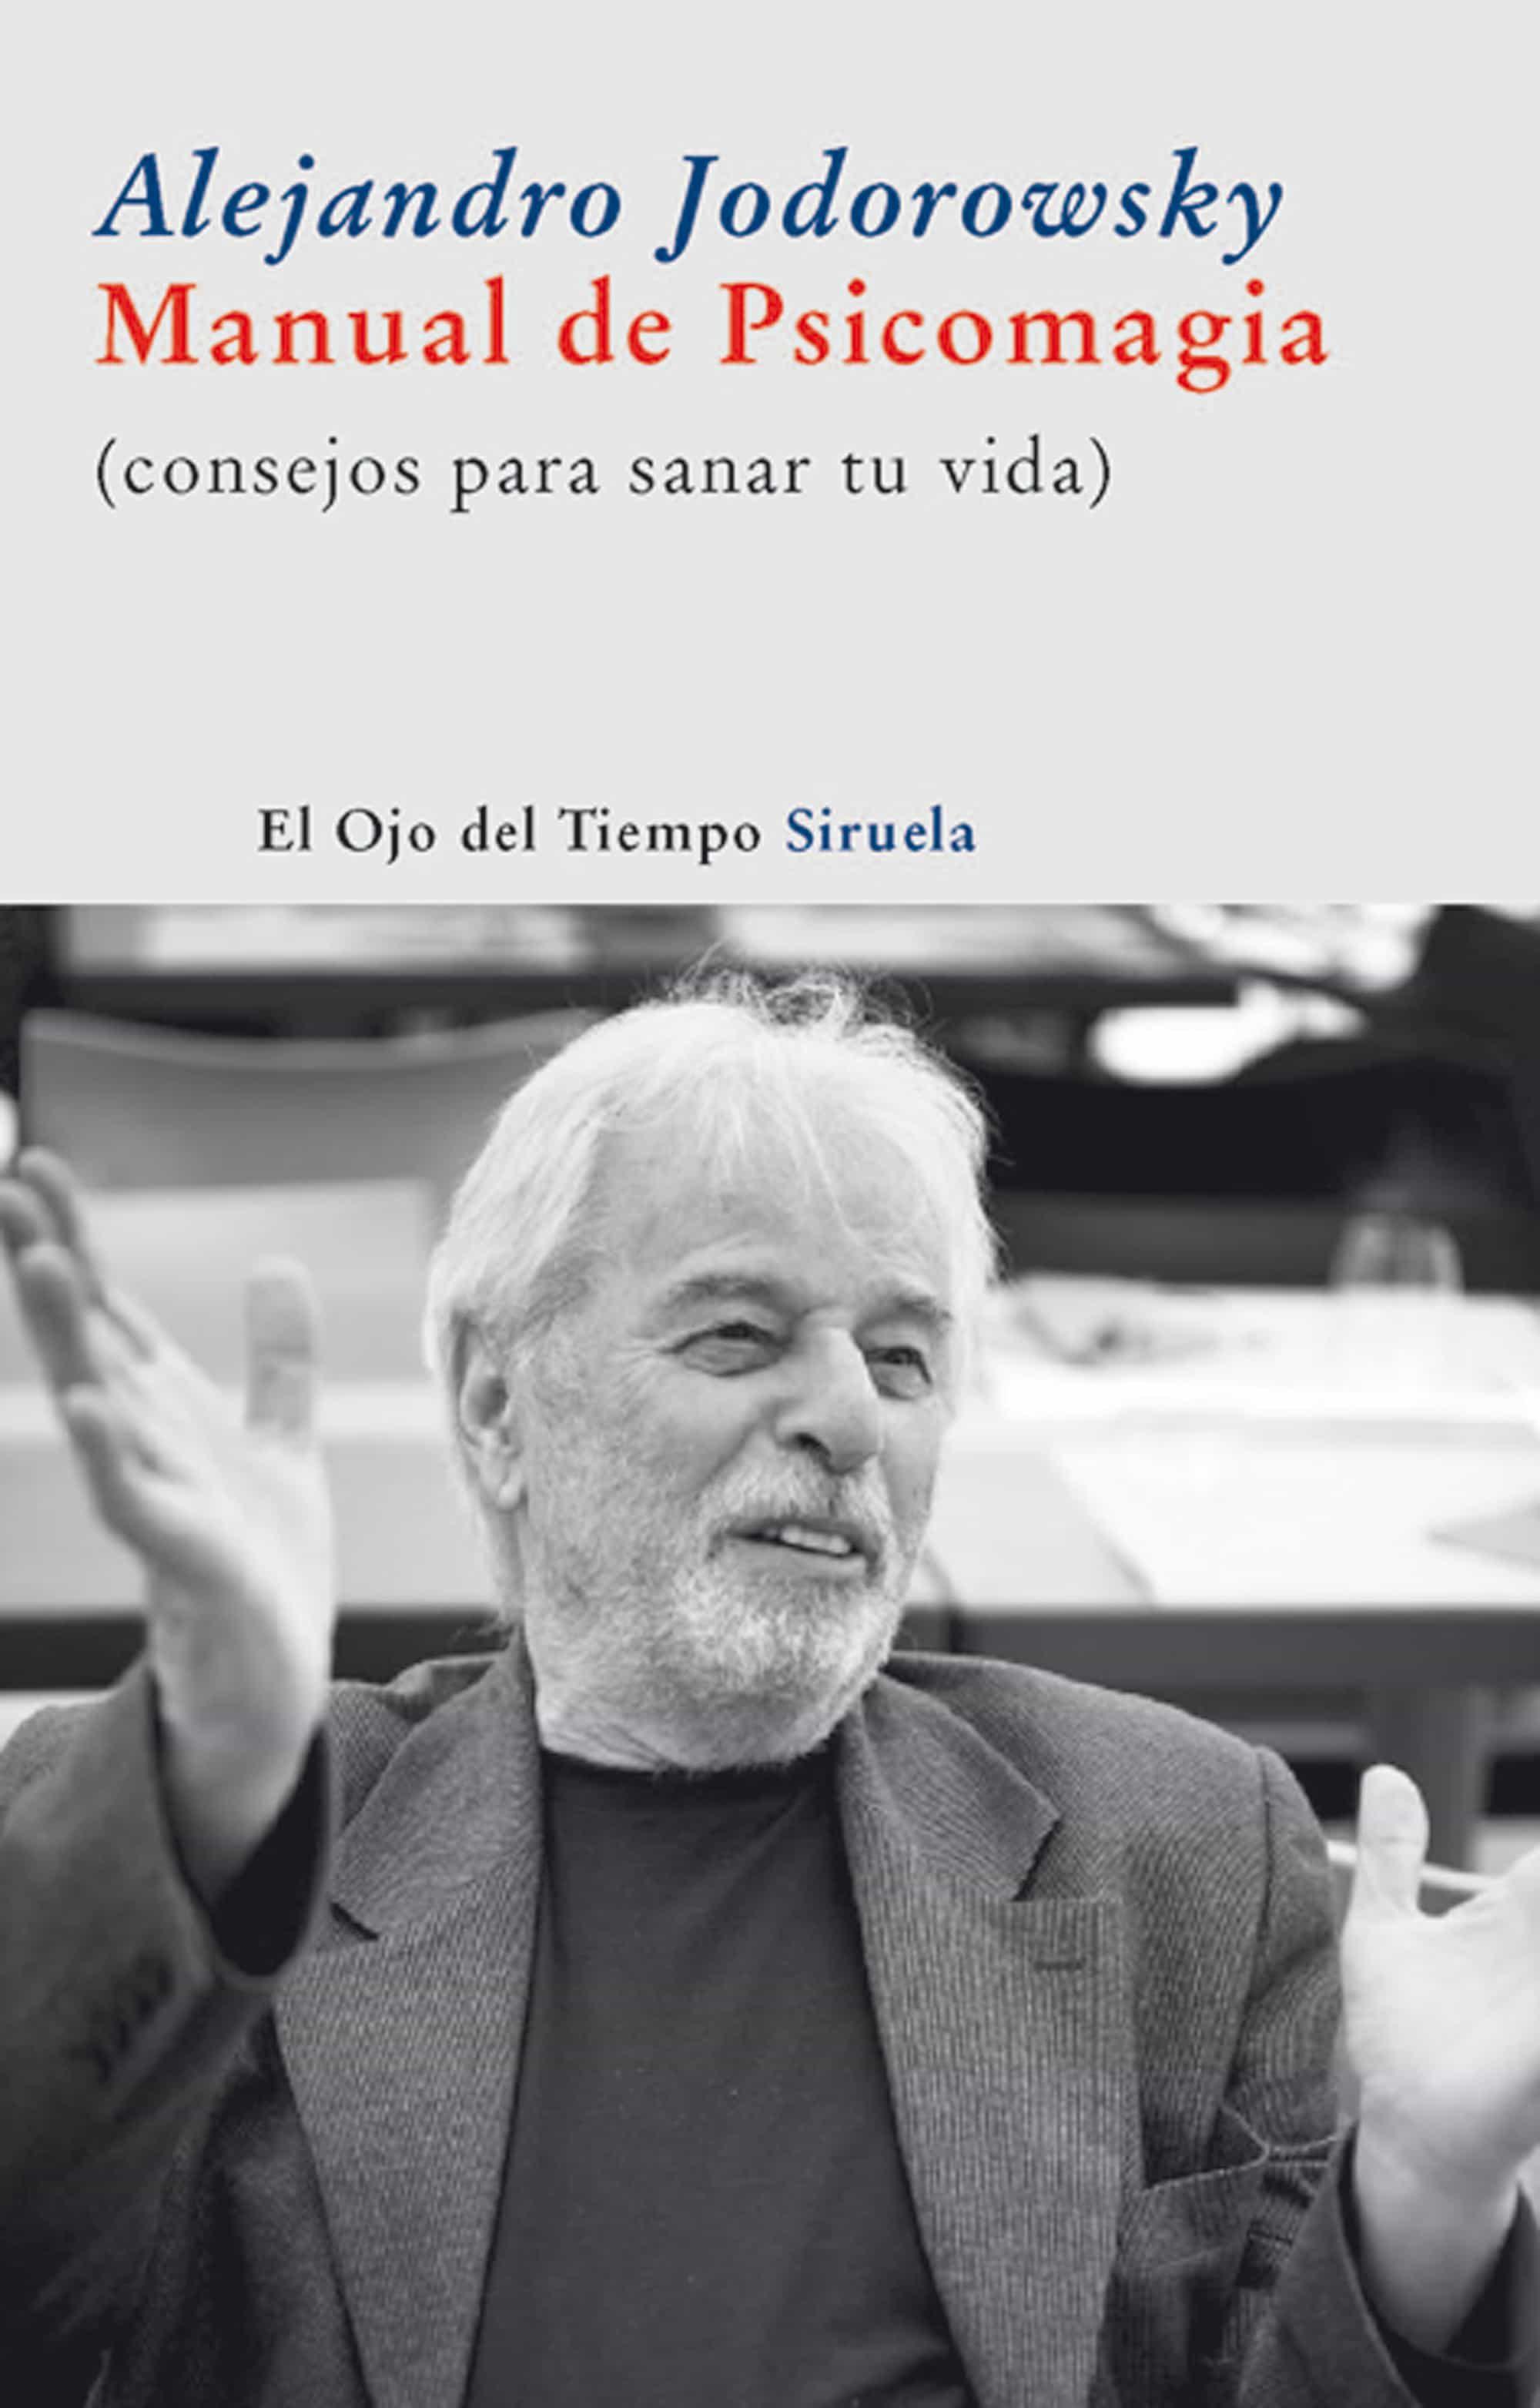 manual de psicomagia alejandro jodorowsky pdf